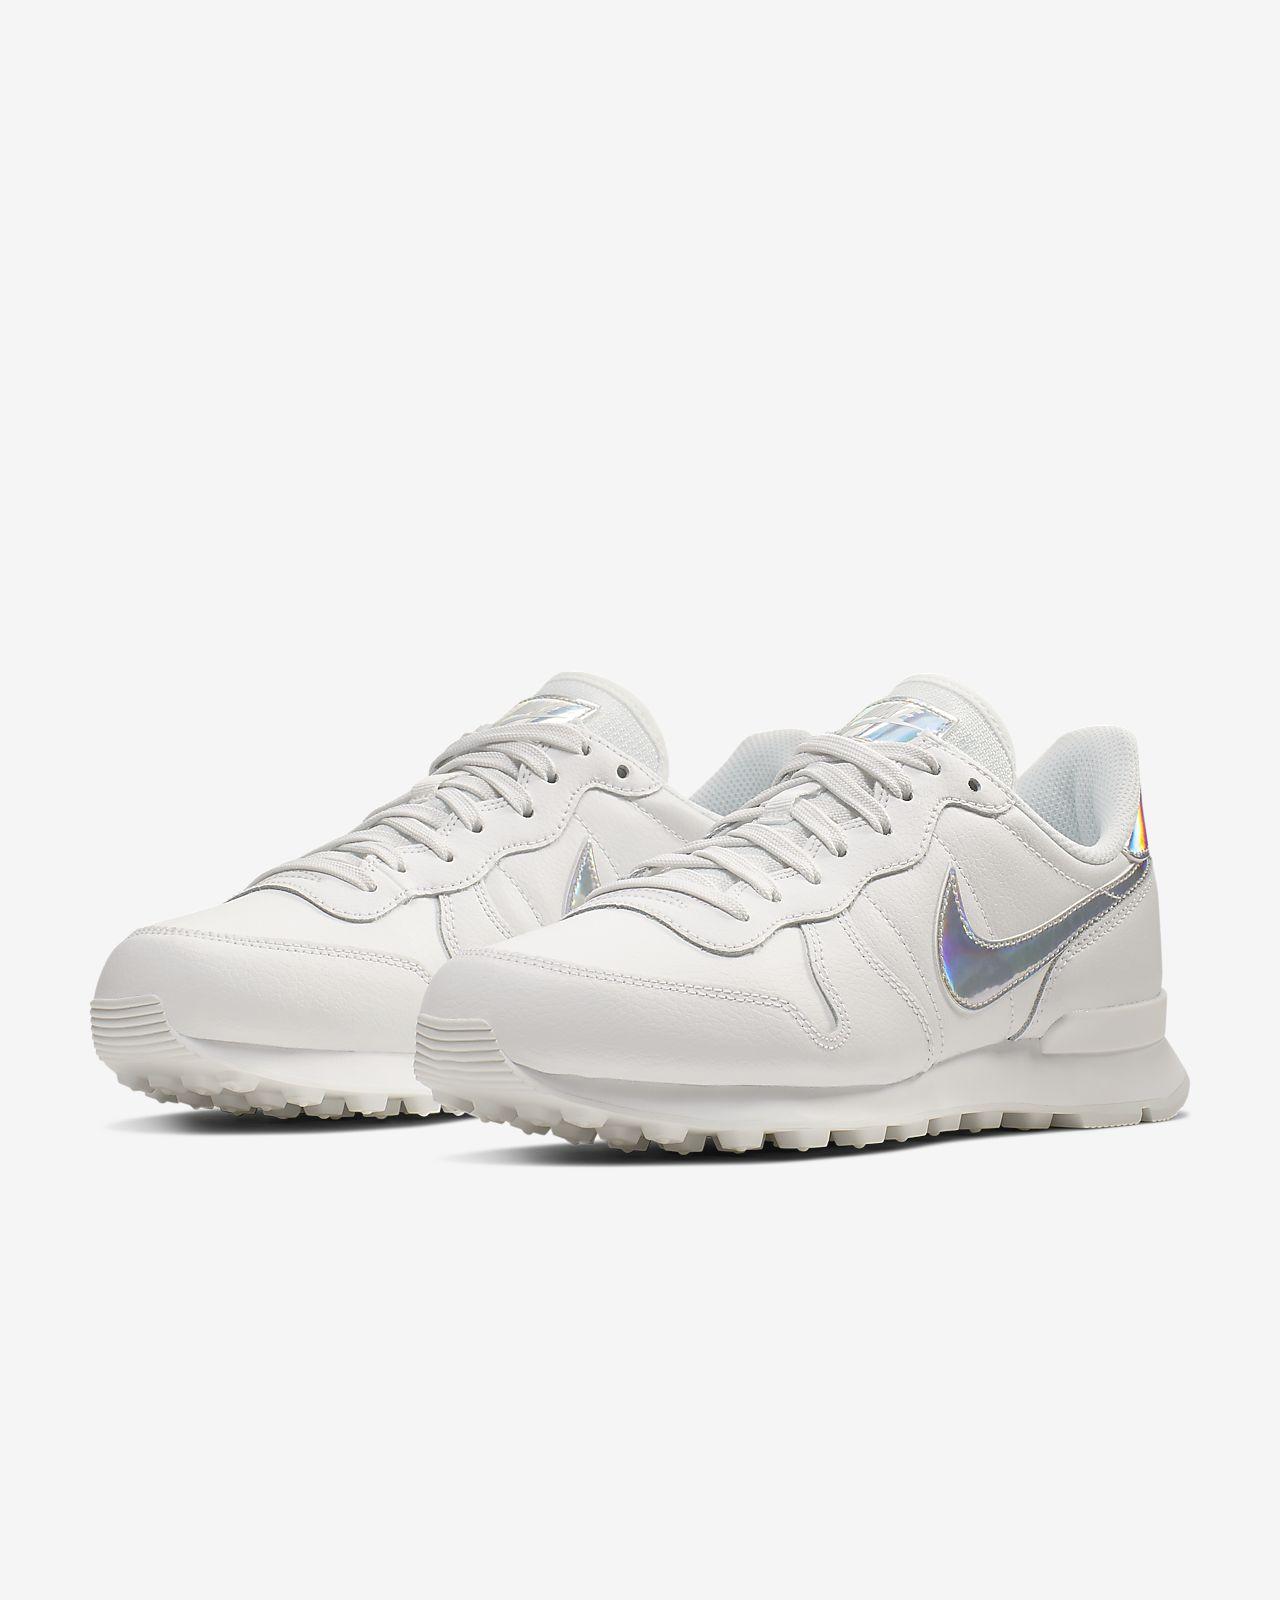 Se Femme Internationalist Pour Chaussure Nike ordCeWBx